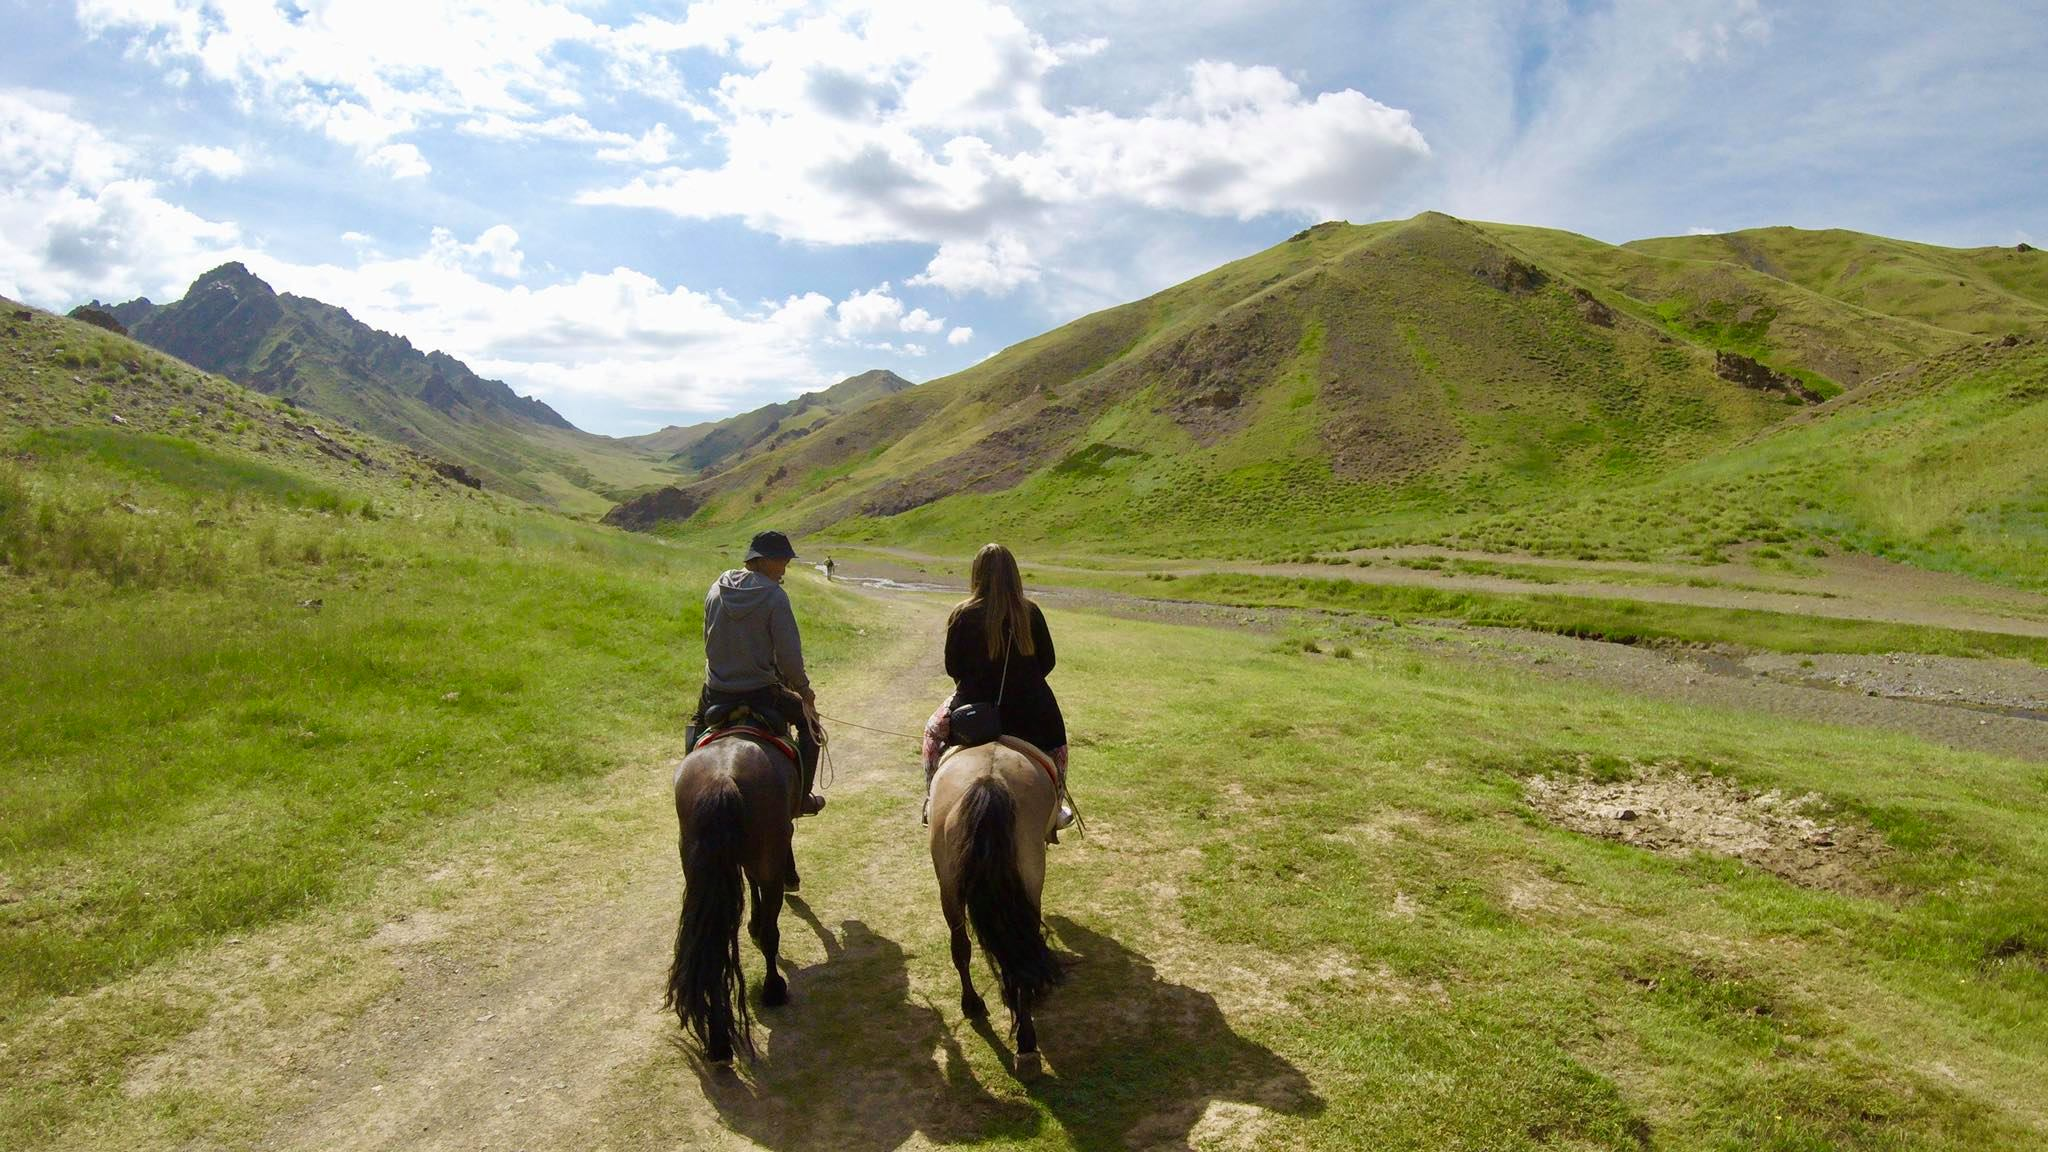 Kach Solo Travels in 2019 Horseback riding trip to the Gobi Gurvan Saikhan National Park3.jpg